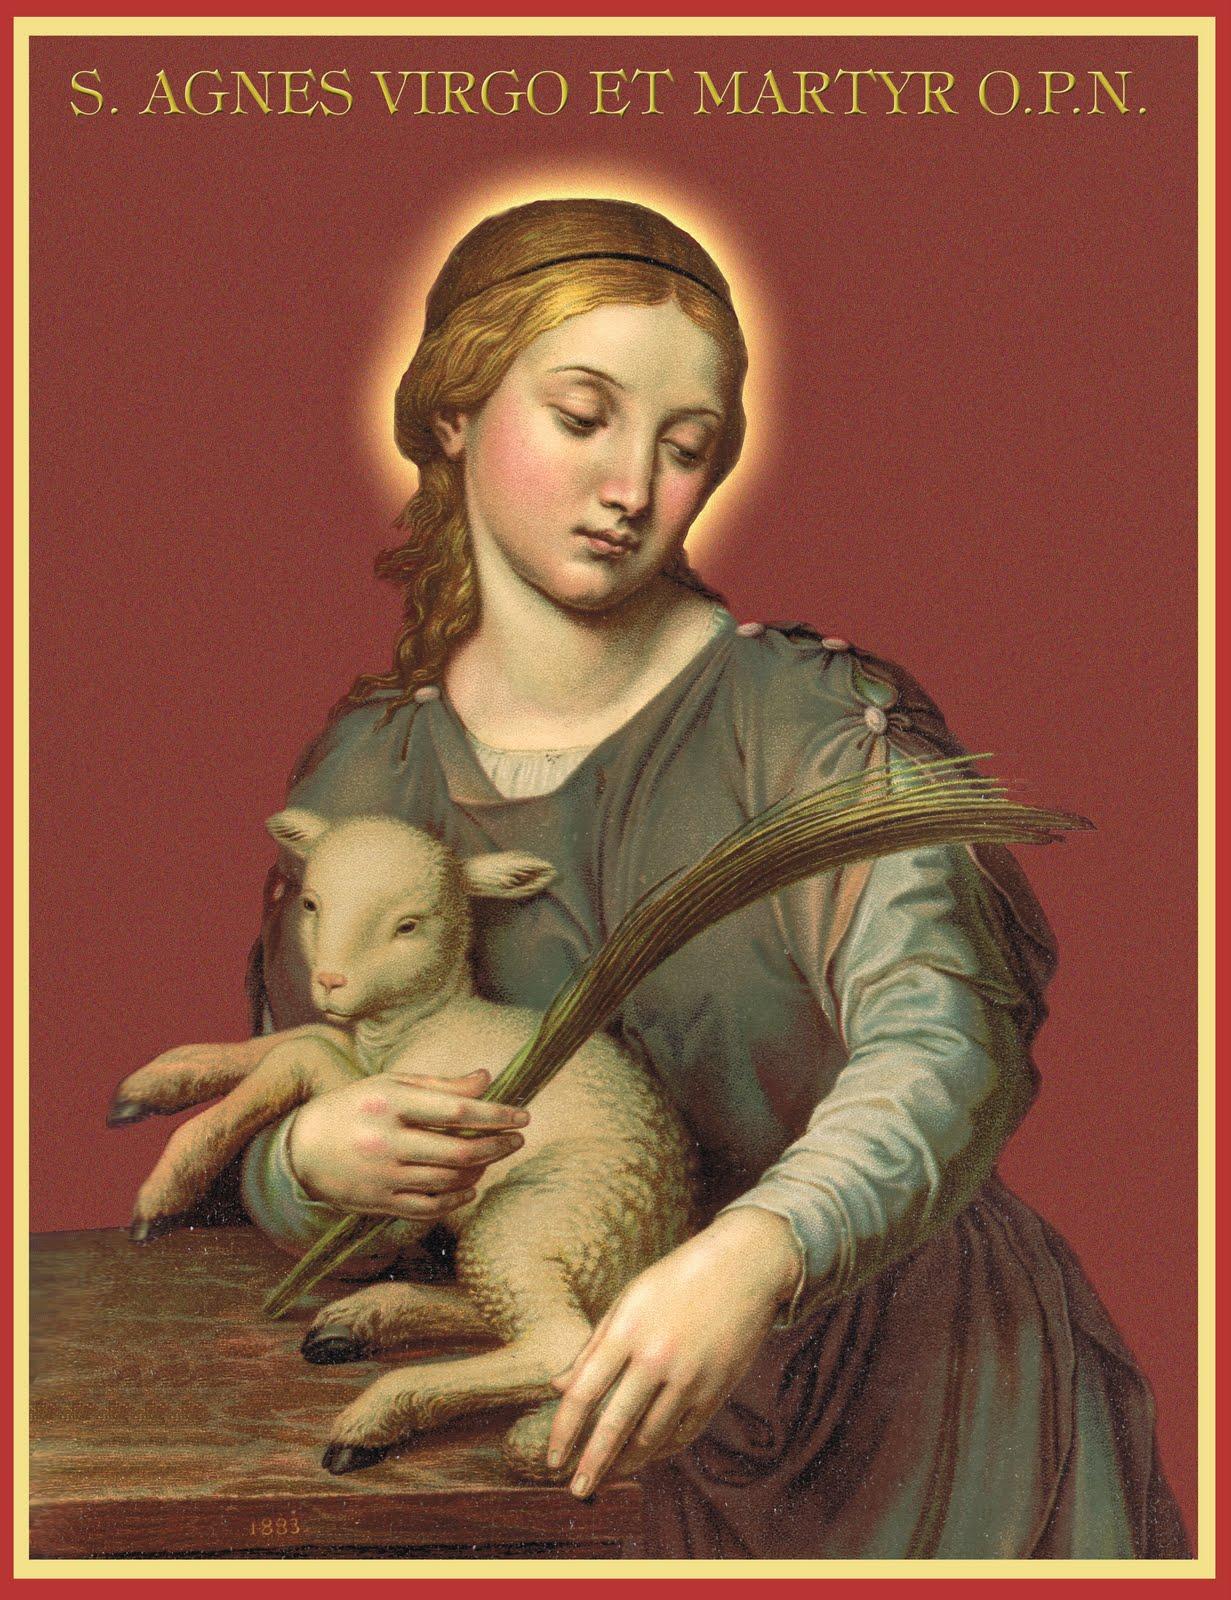 st-agnes-virgin-martyr